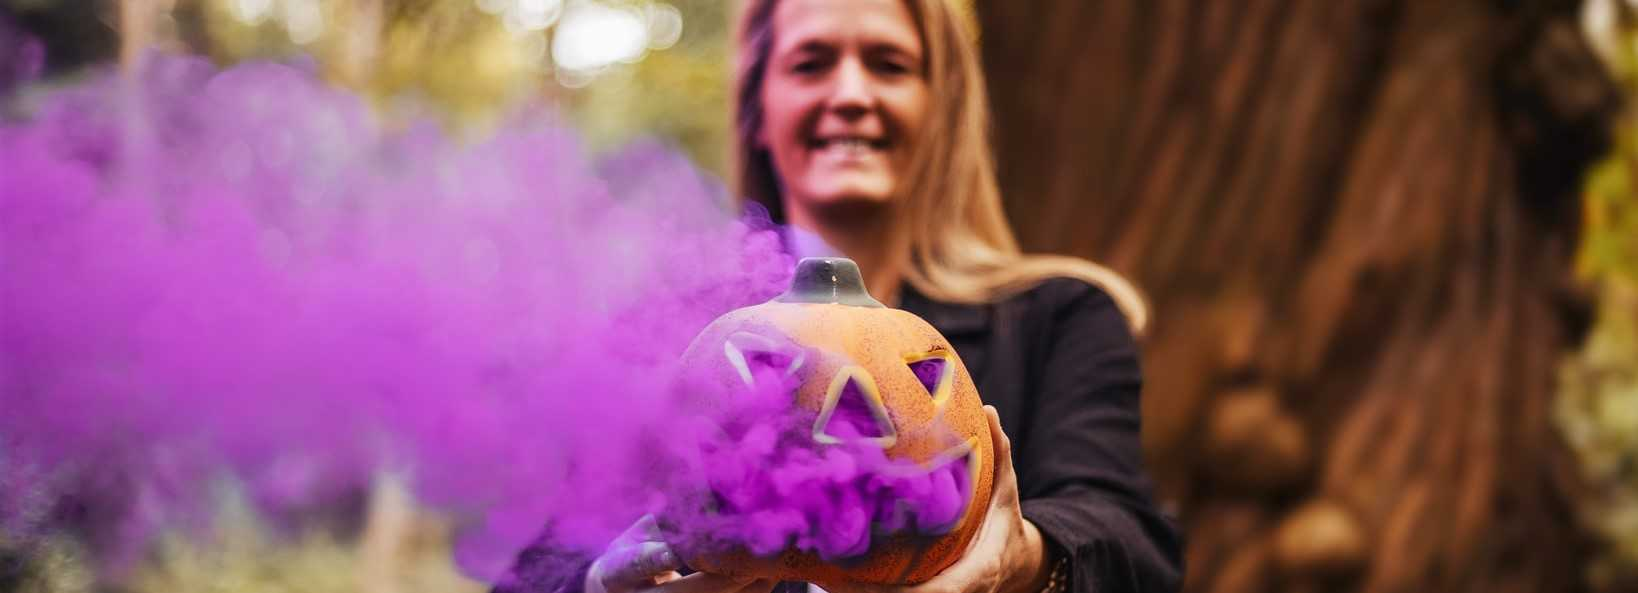 Smokey Pumpkin for Halloween   Breast Cancer Car Donations